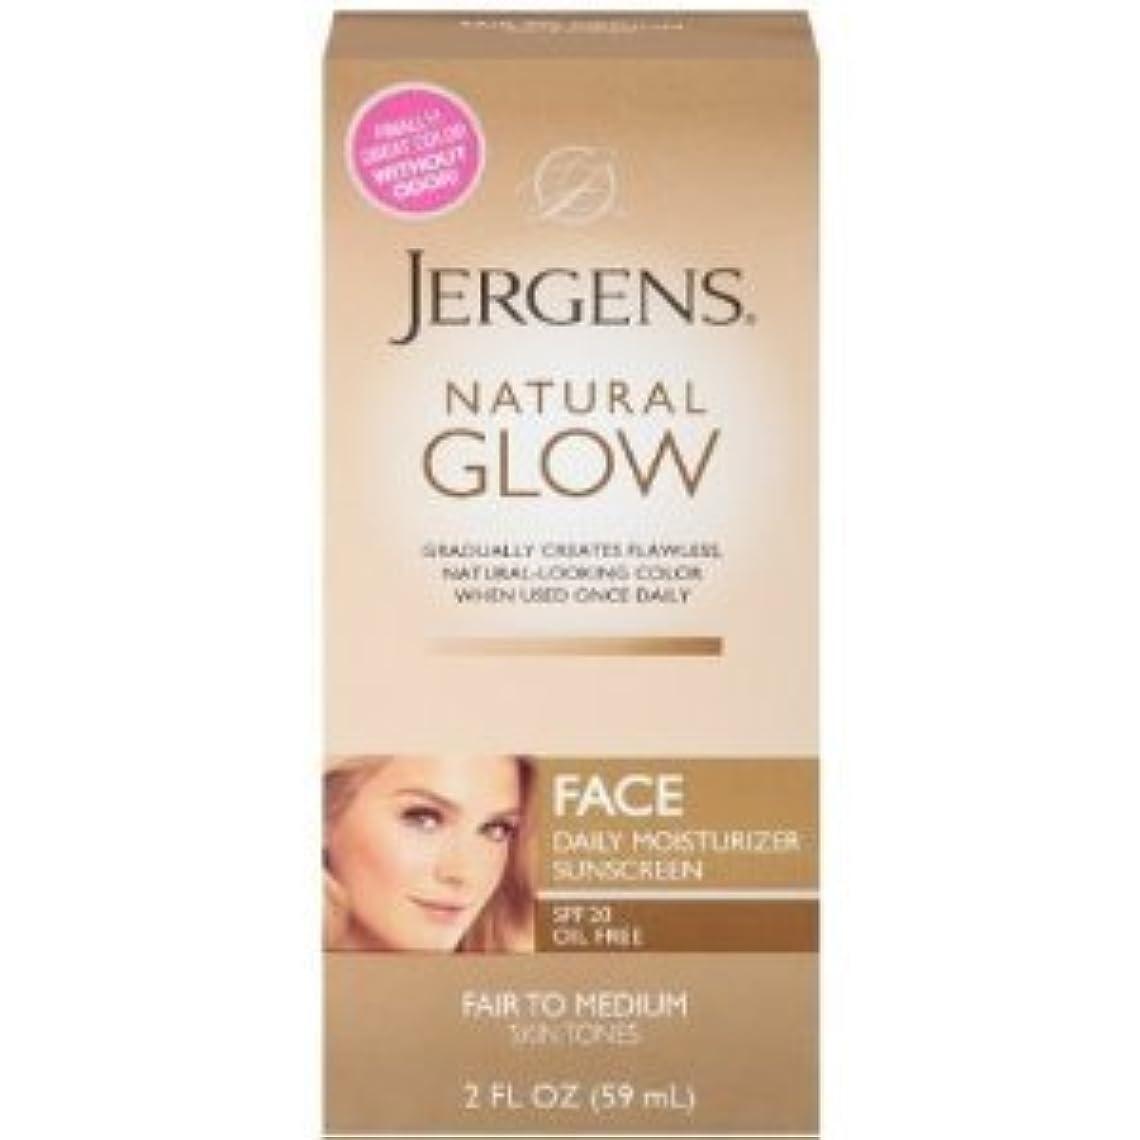 電圧不良改善Natural Glow Healthy Complexion Daily Facial Moisturizer, SPF 20, Fair to Medium Tan, (59ml) (海外直送品)